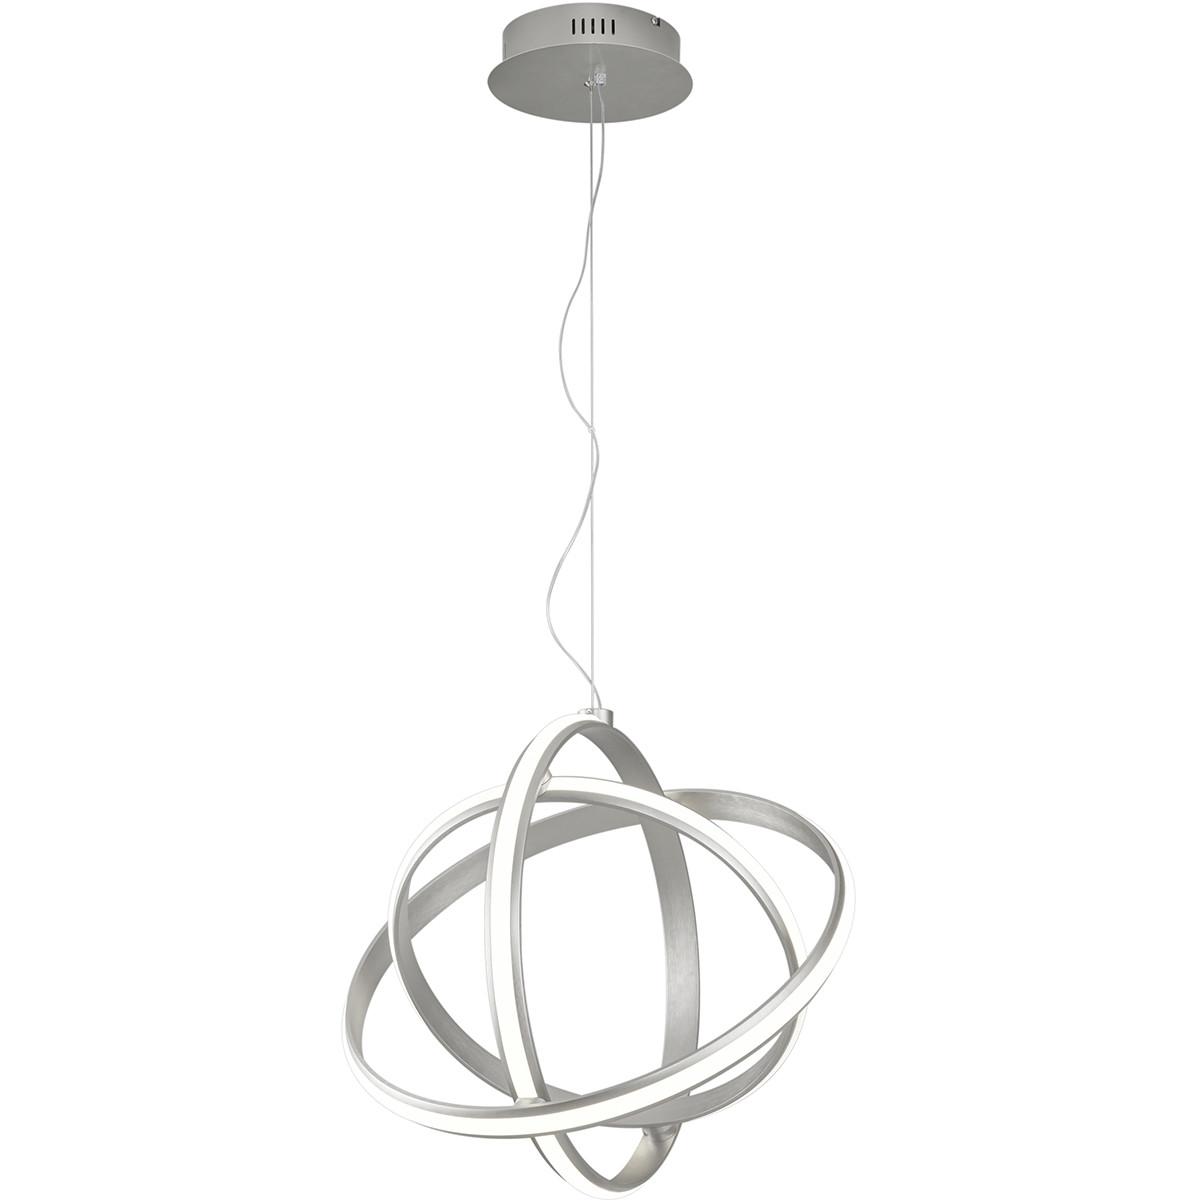 LED Hanglamp - Trion Compito - 45W - Warm Wit 3000K - Dimbaar - Rond - Mat Nikkel - Aluminium